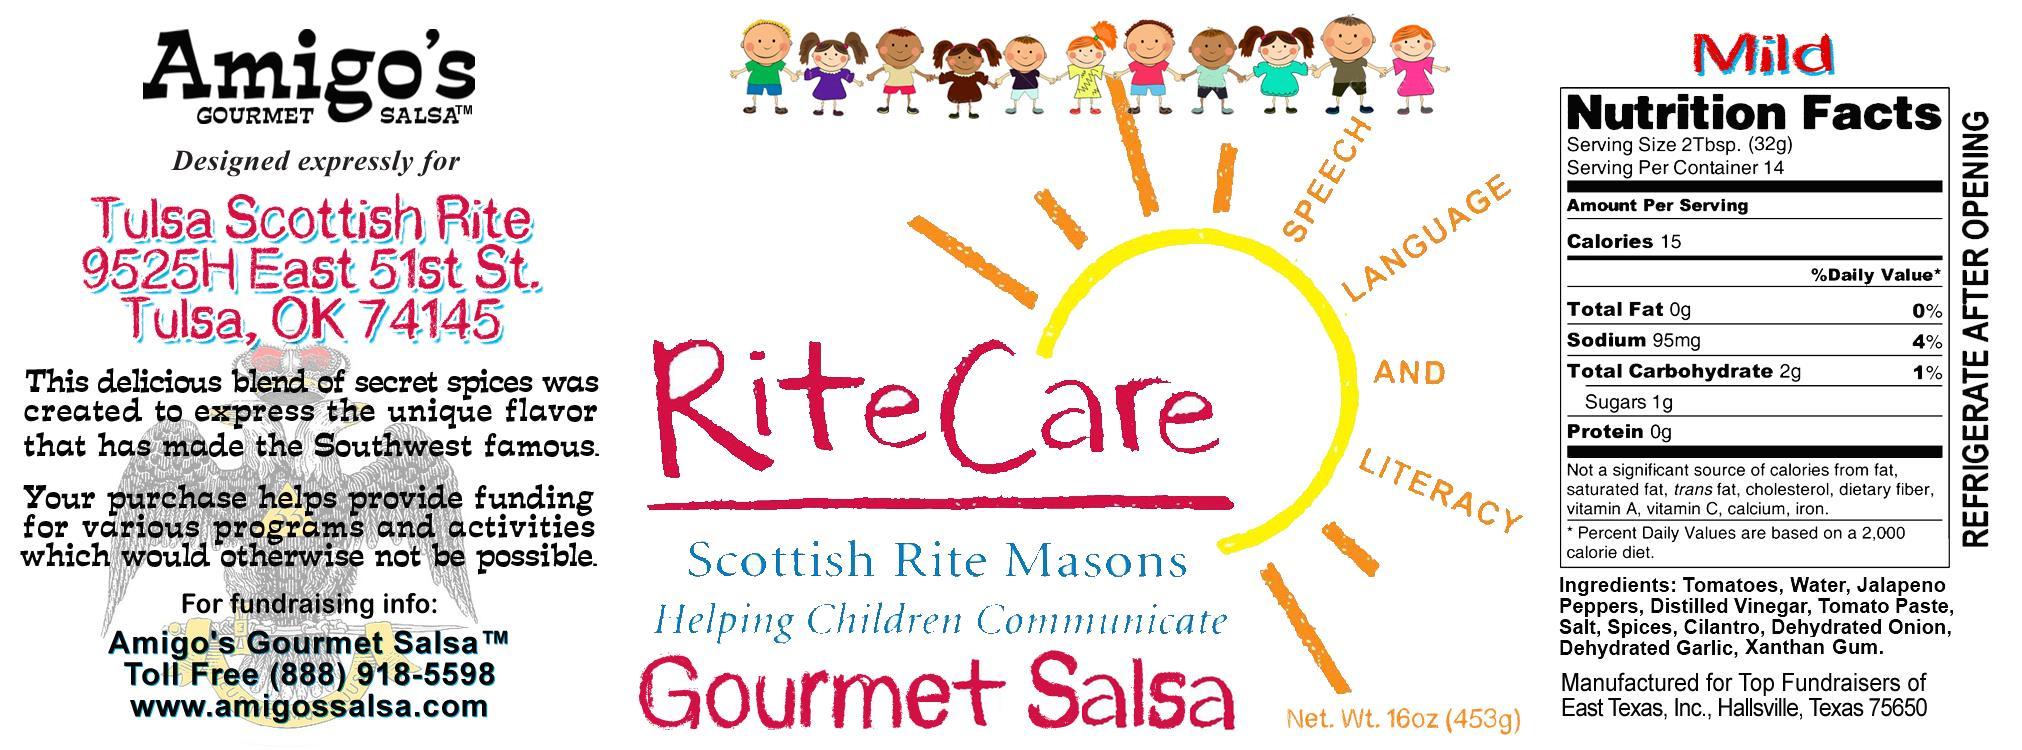 Scottish Rite Masons Jar MILD.jpg